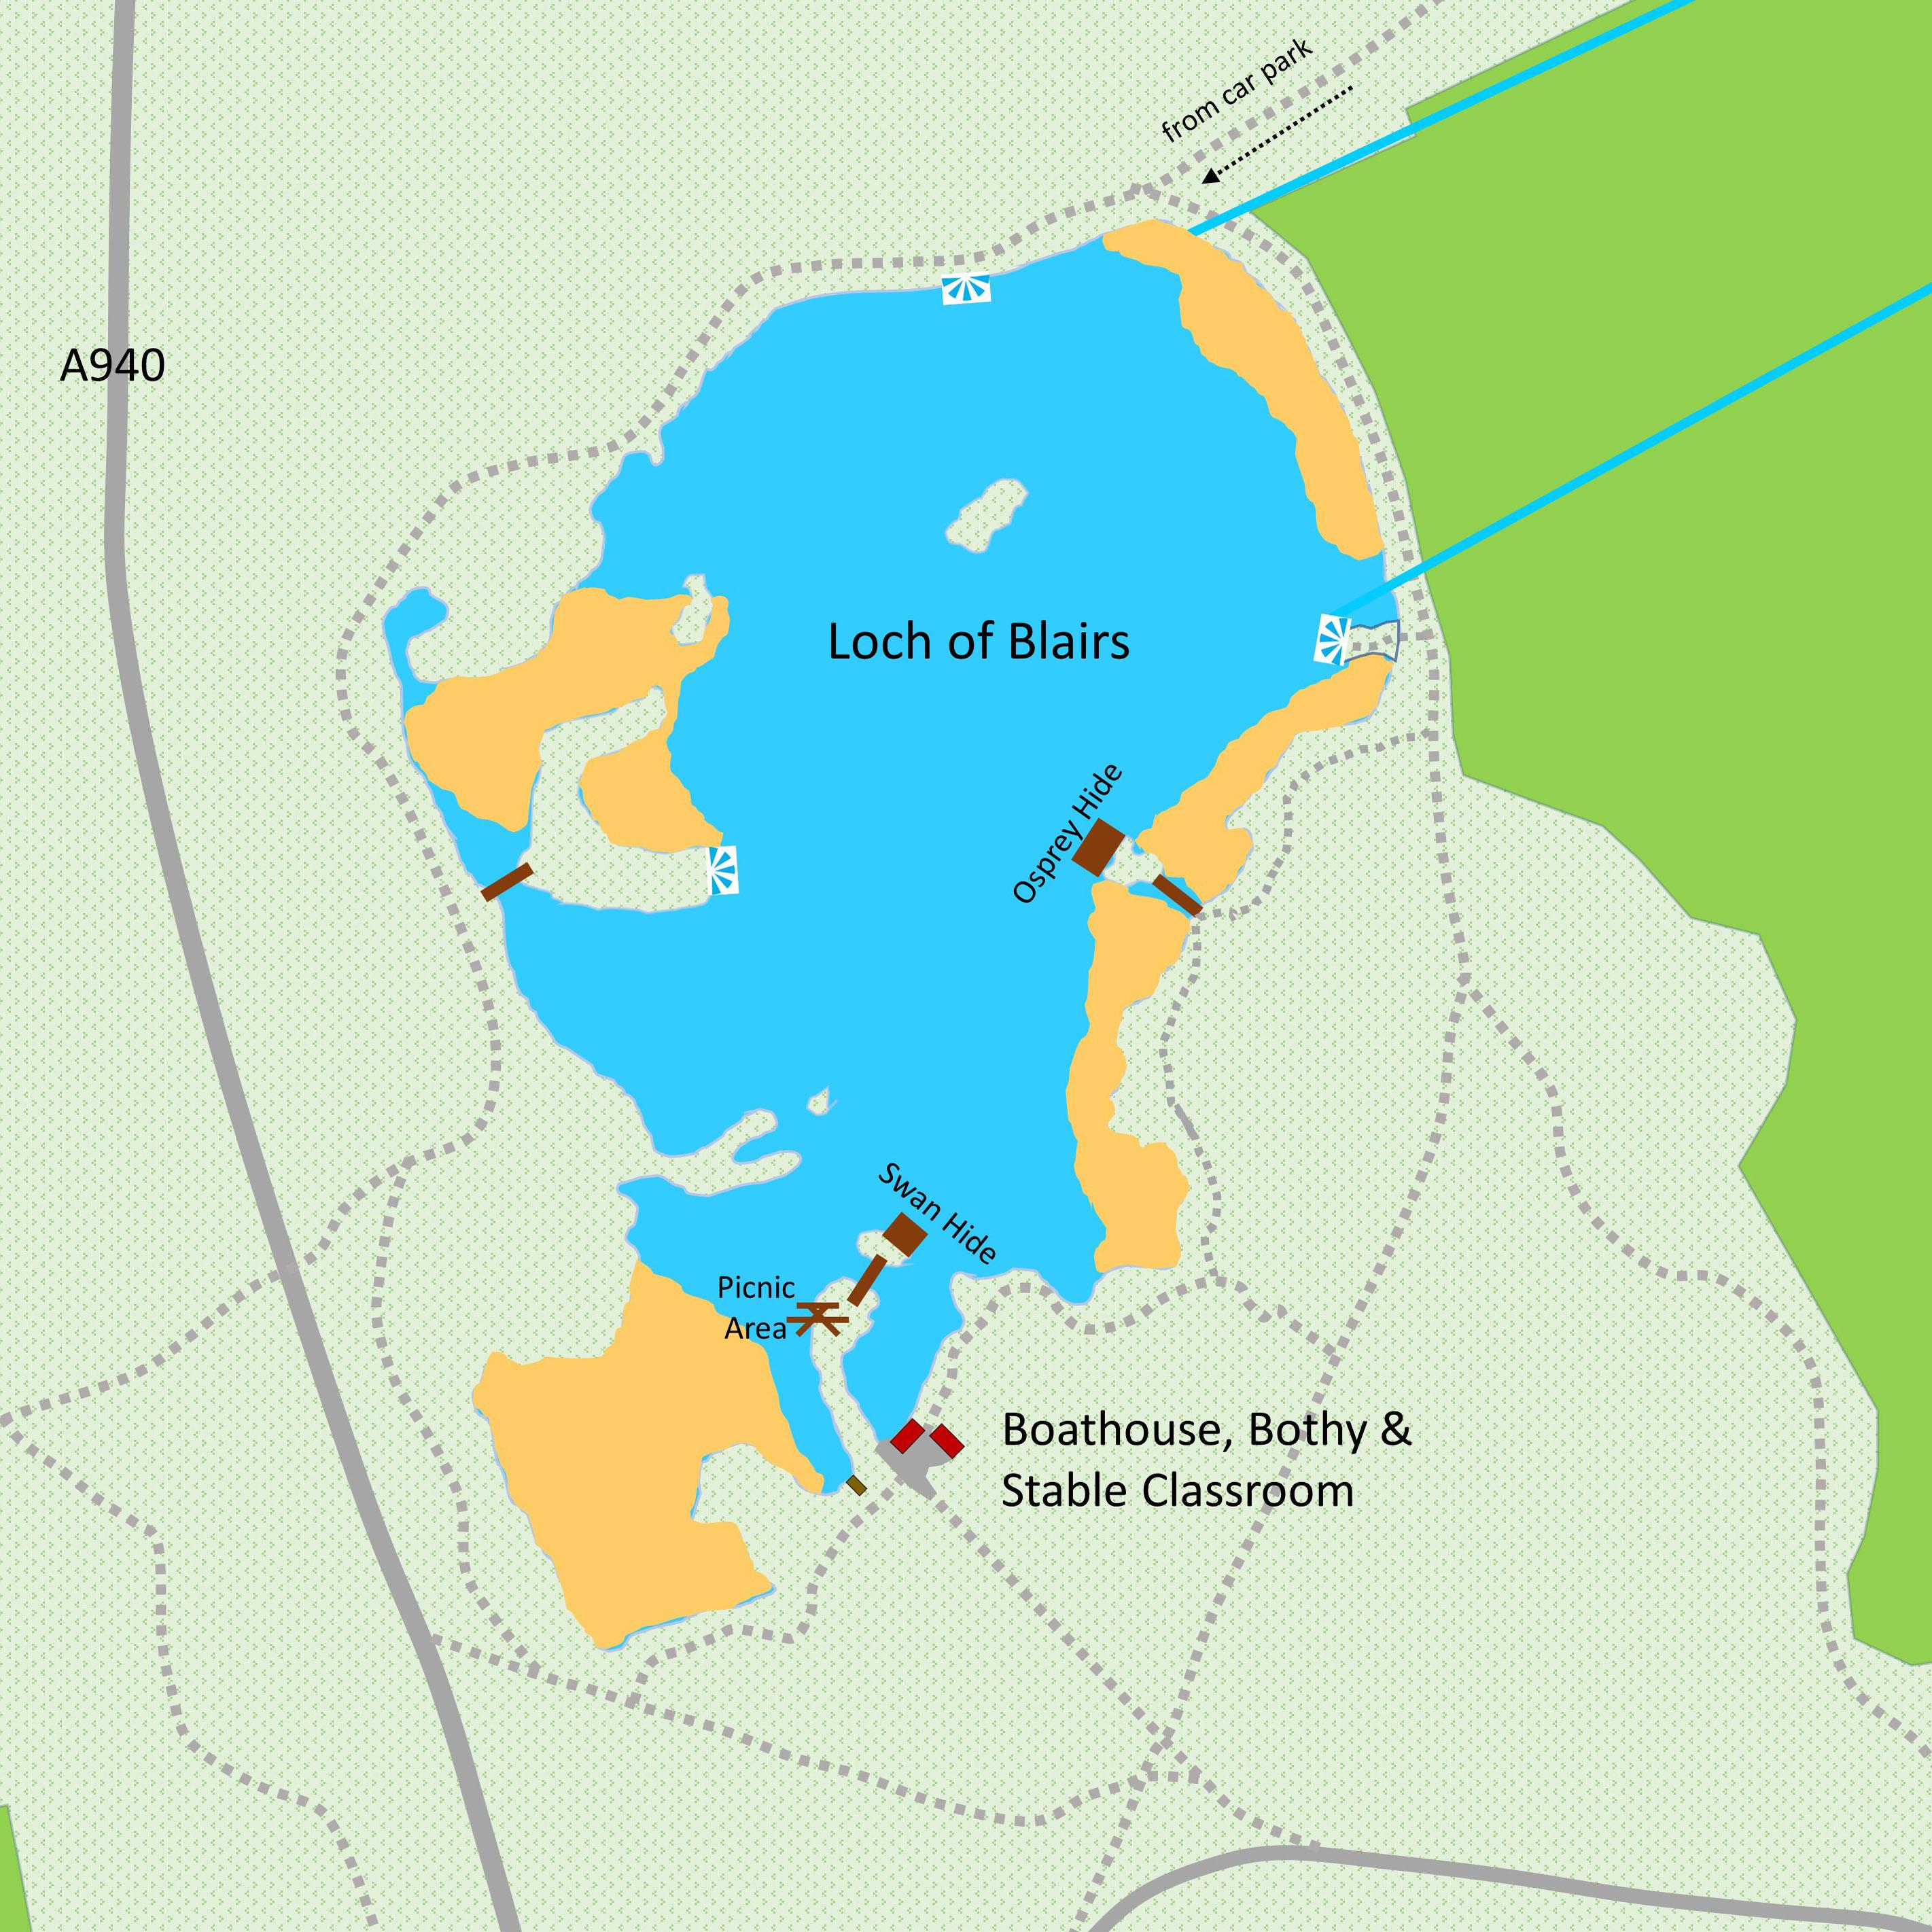 Lochside paths